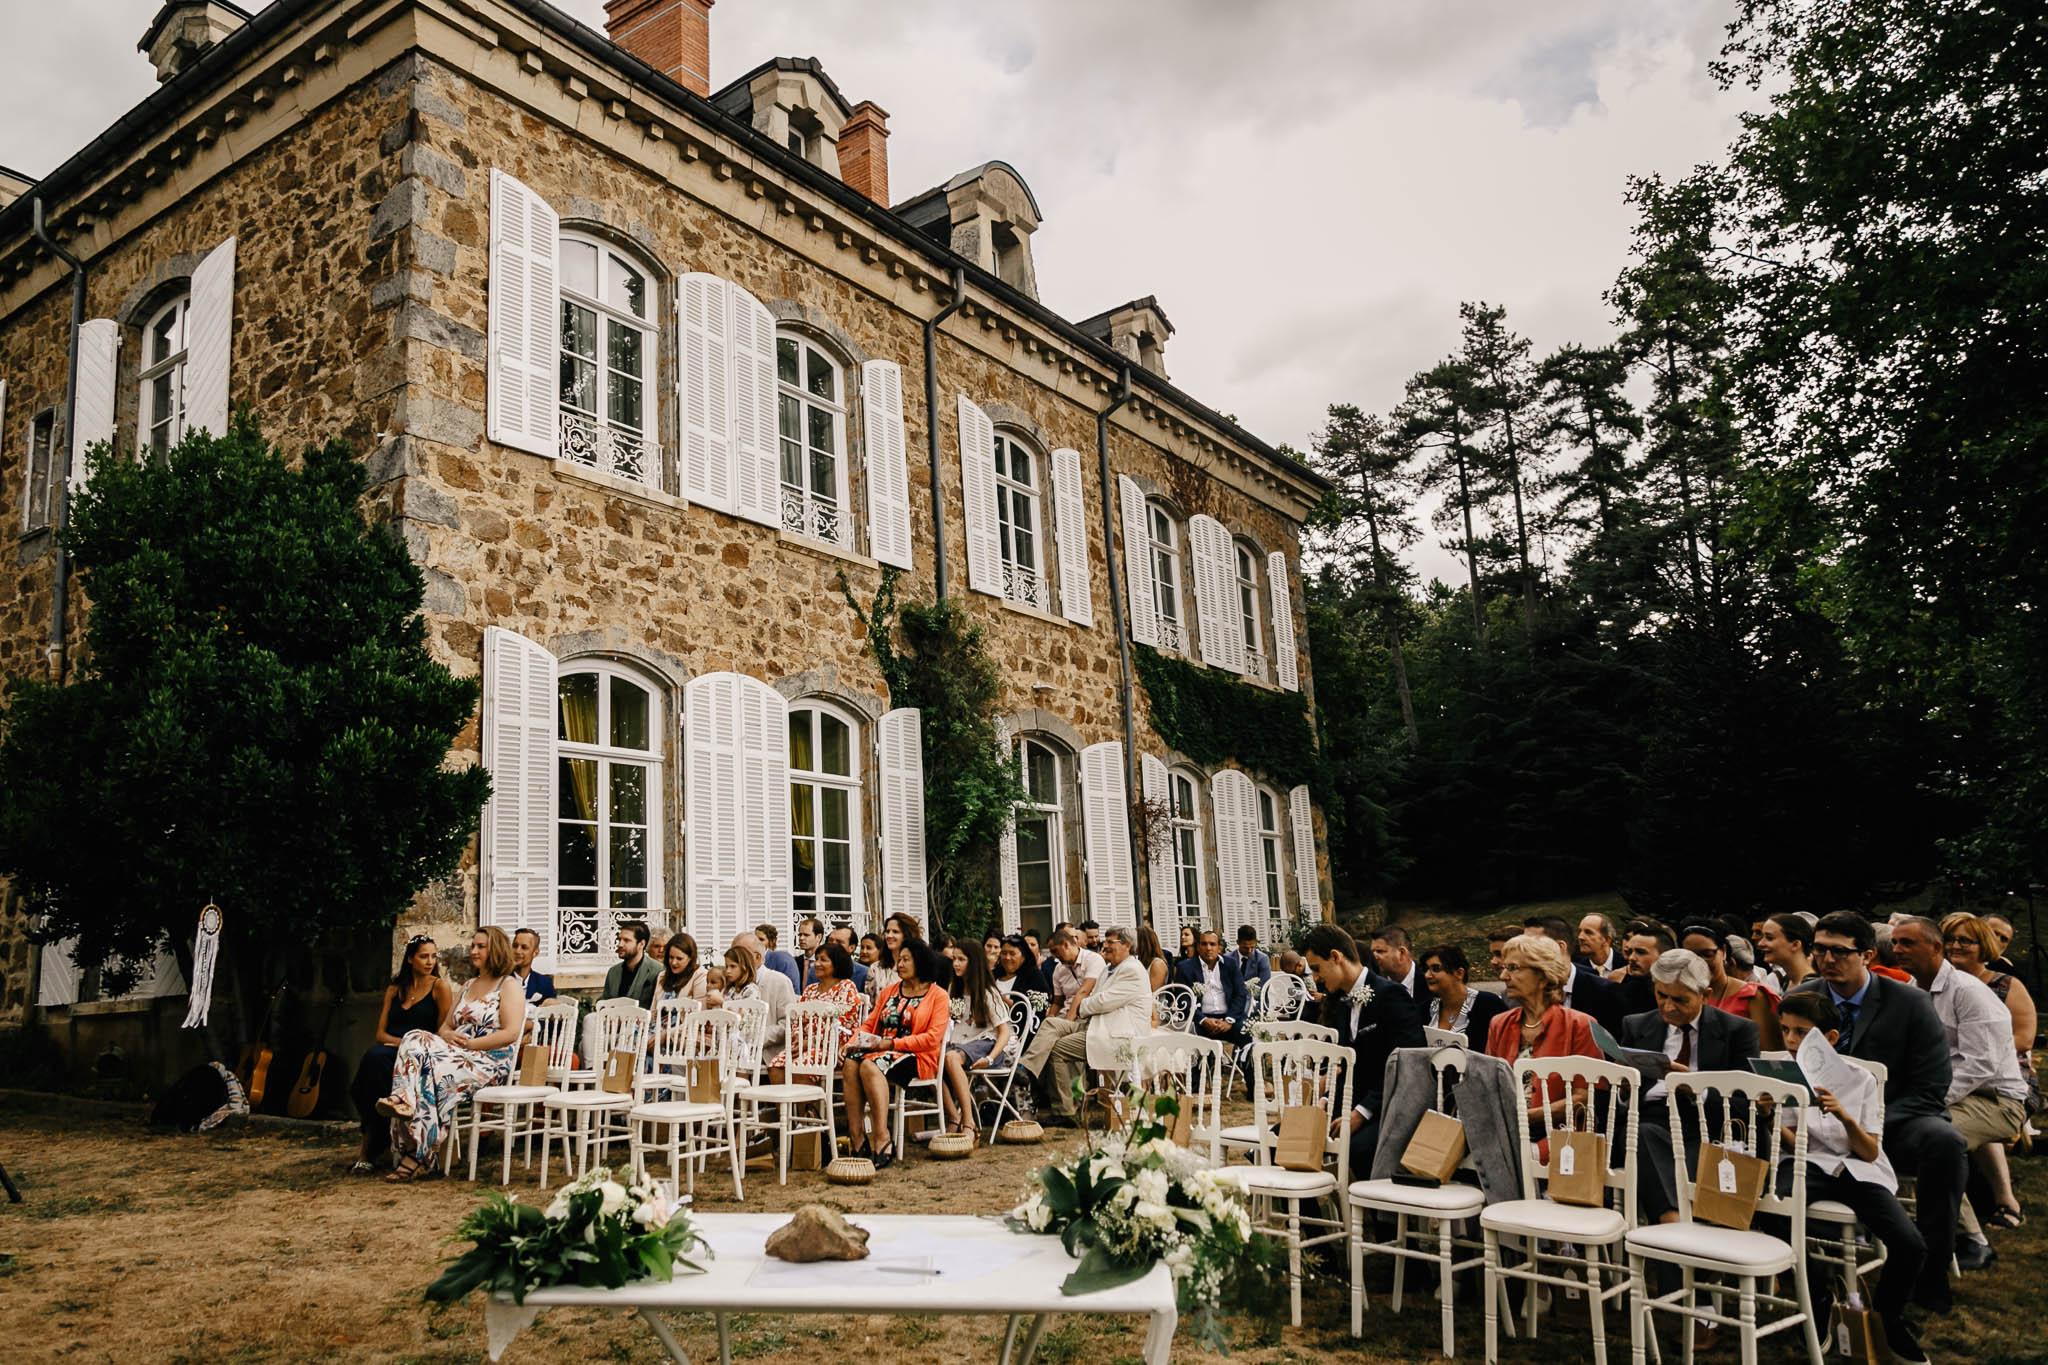 mariage-chateau-gaudras-ingold-25.jpg